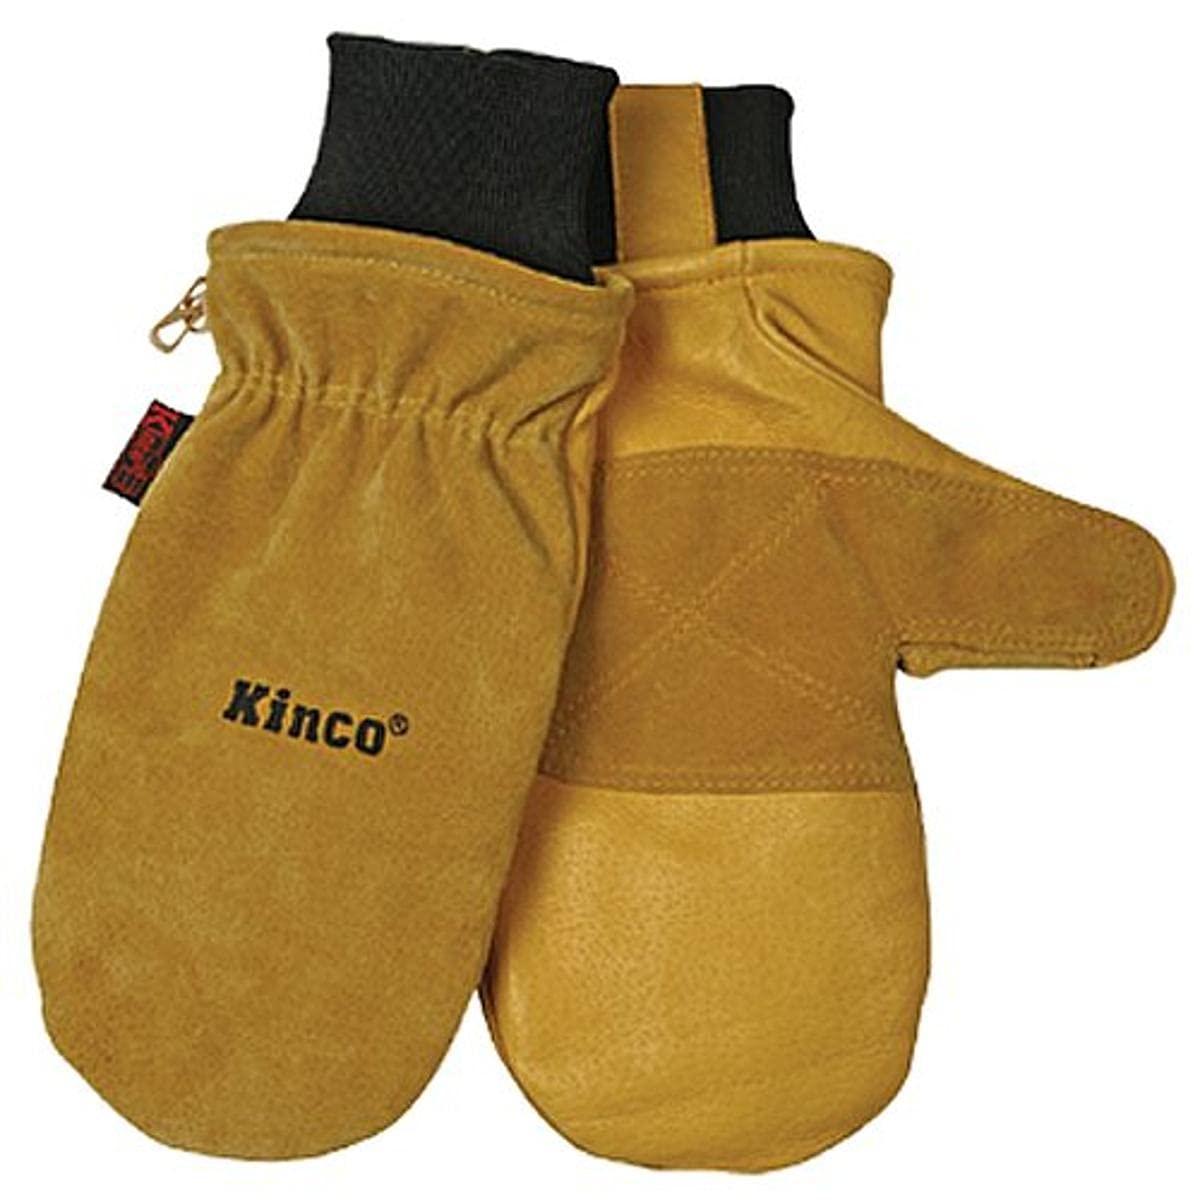 KINCO Max 52% OFF Manufacturer OFFicial shop 901T-L Men's Pigskin Skin Gloves Therma Heat Keep Mitten